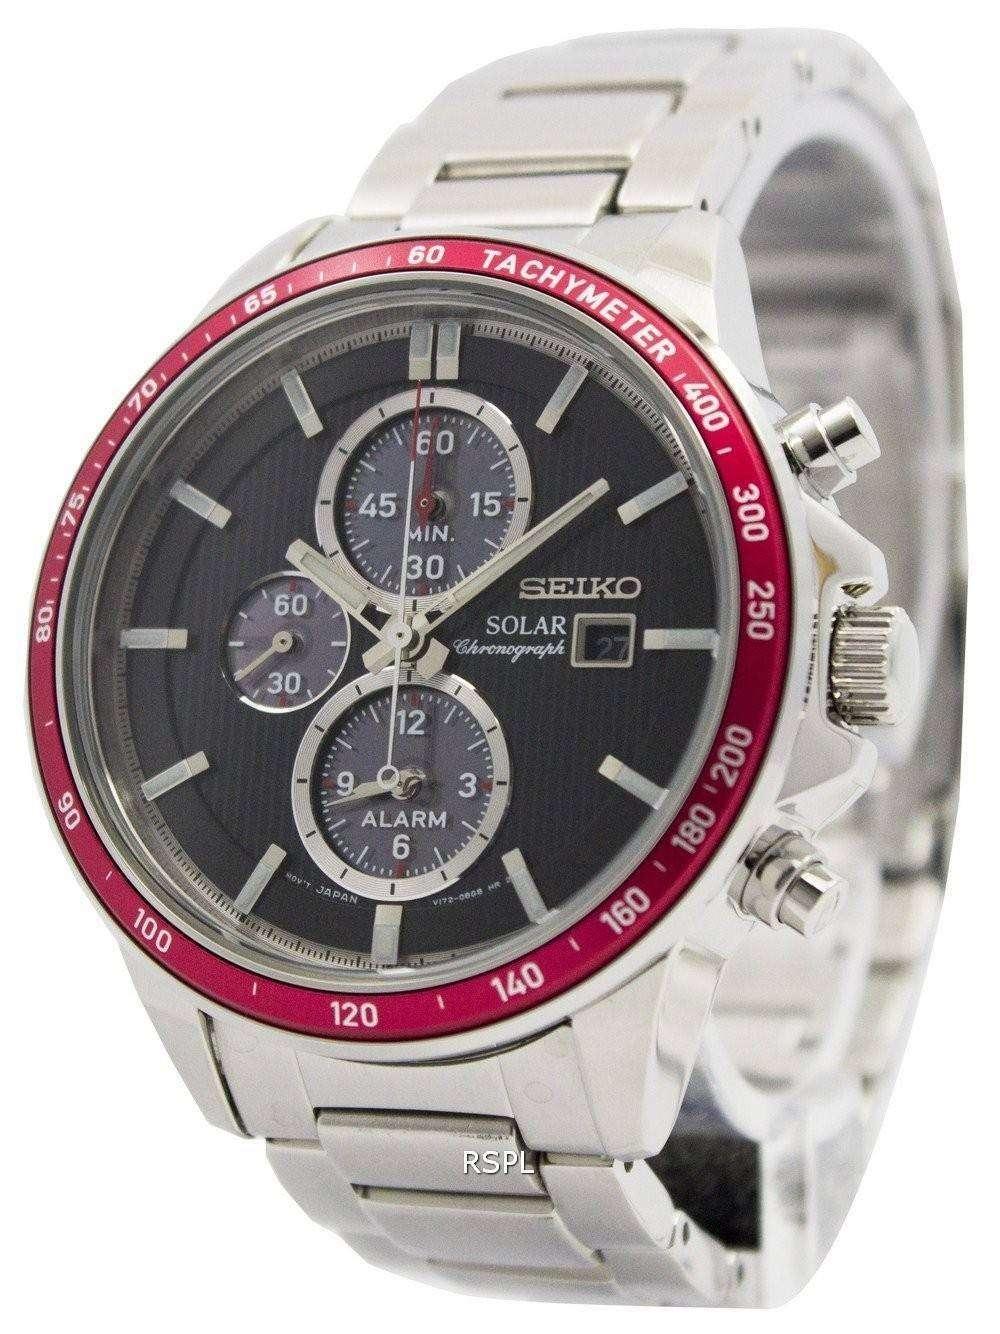 6677cbac1e8 Seiko Solar Chronograph Alarm SSC433P1 SSC433P Men s Watch - ZetaWatches